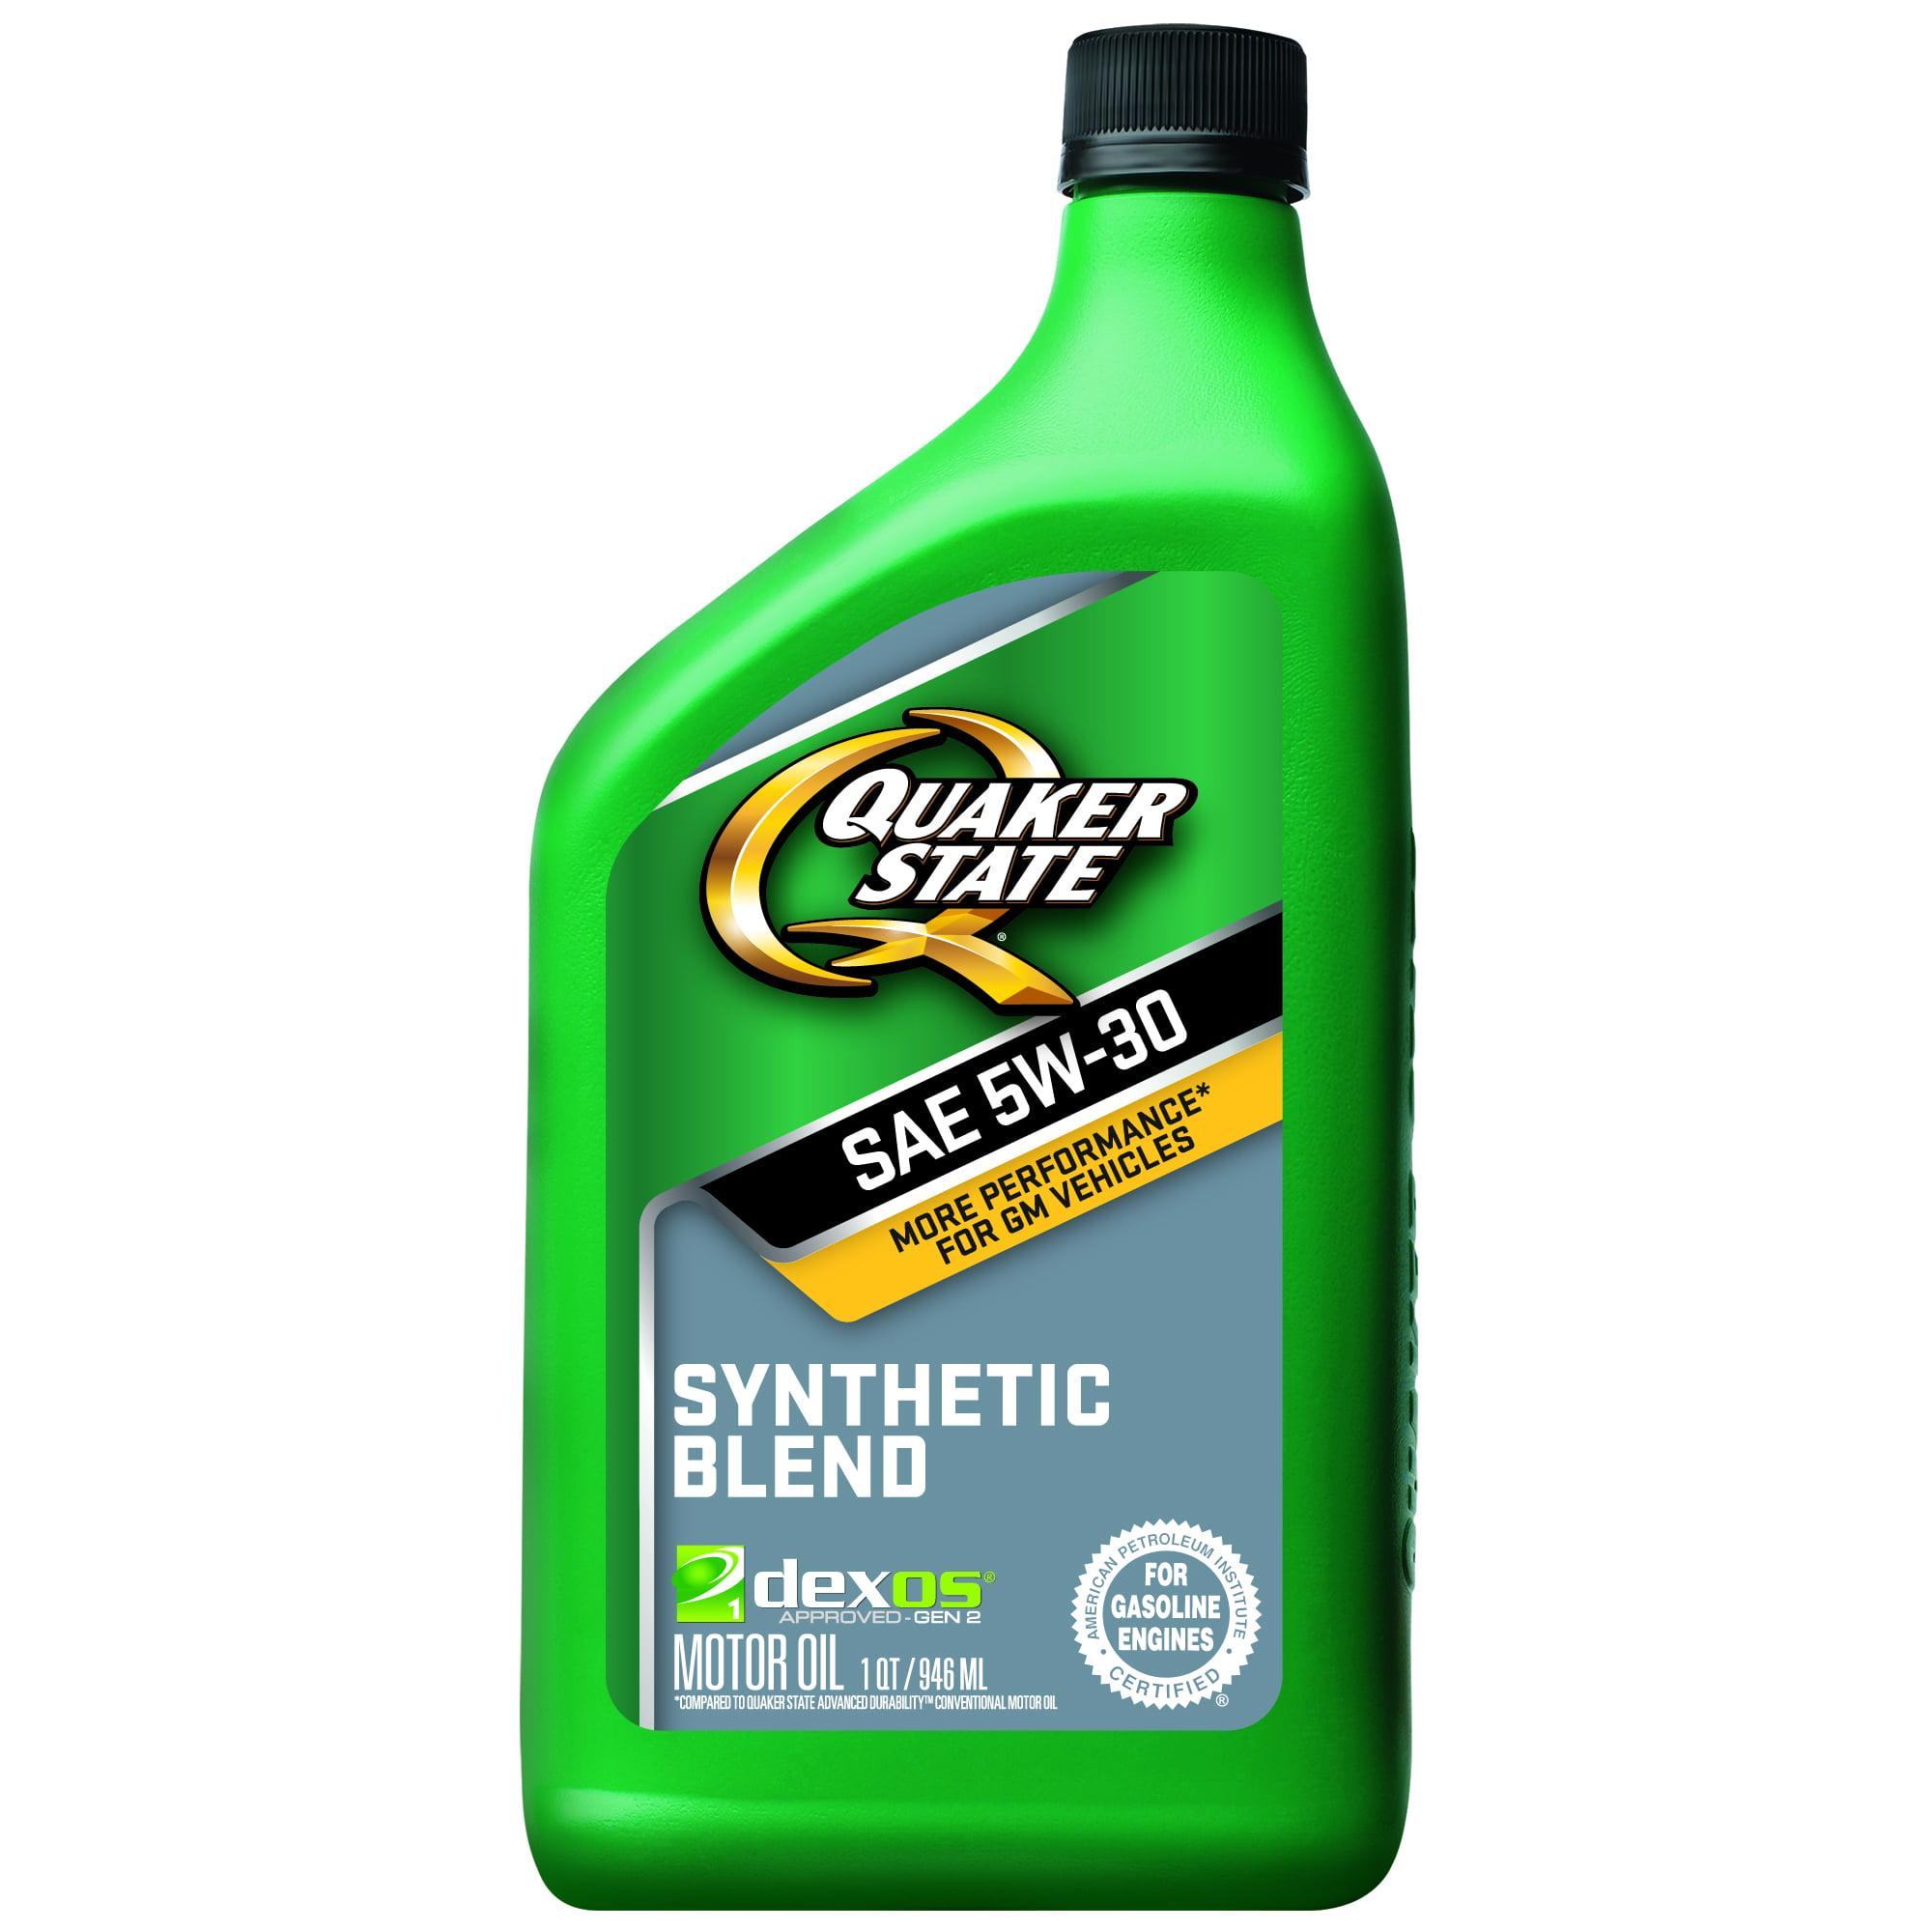 Quaker State 5W-30 Dexos Synthetic Blend Motor Oil, 1 qt